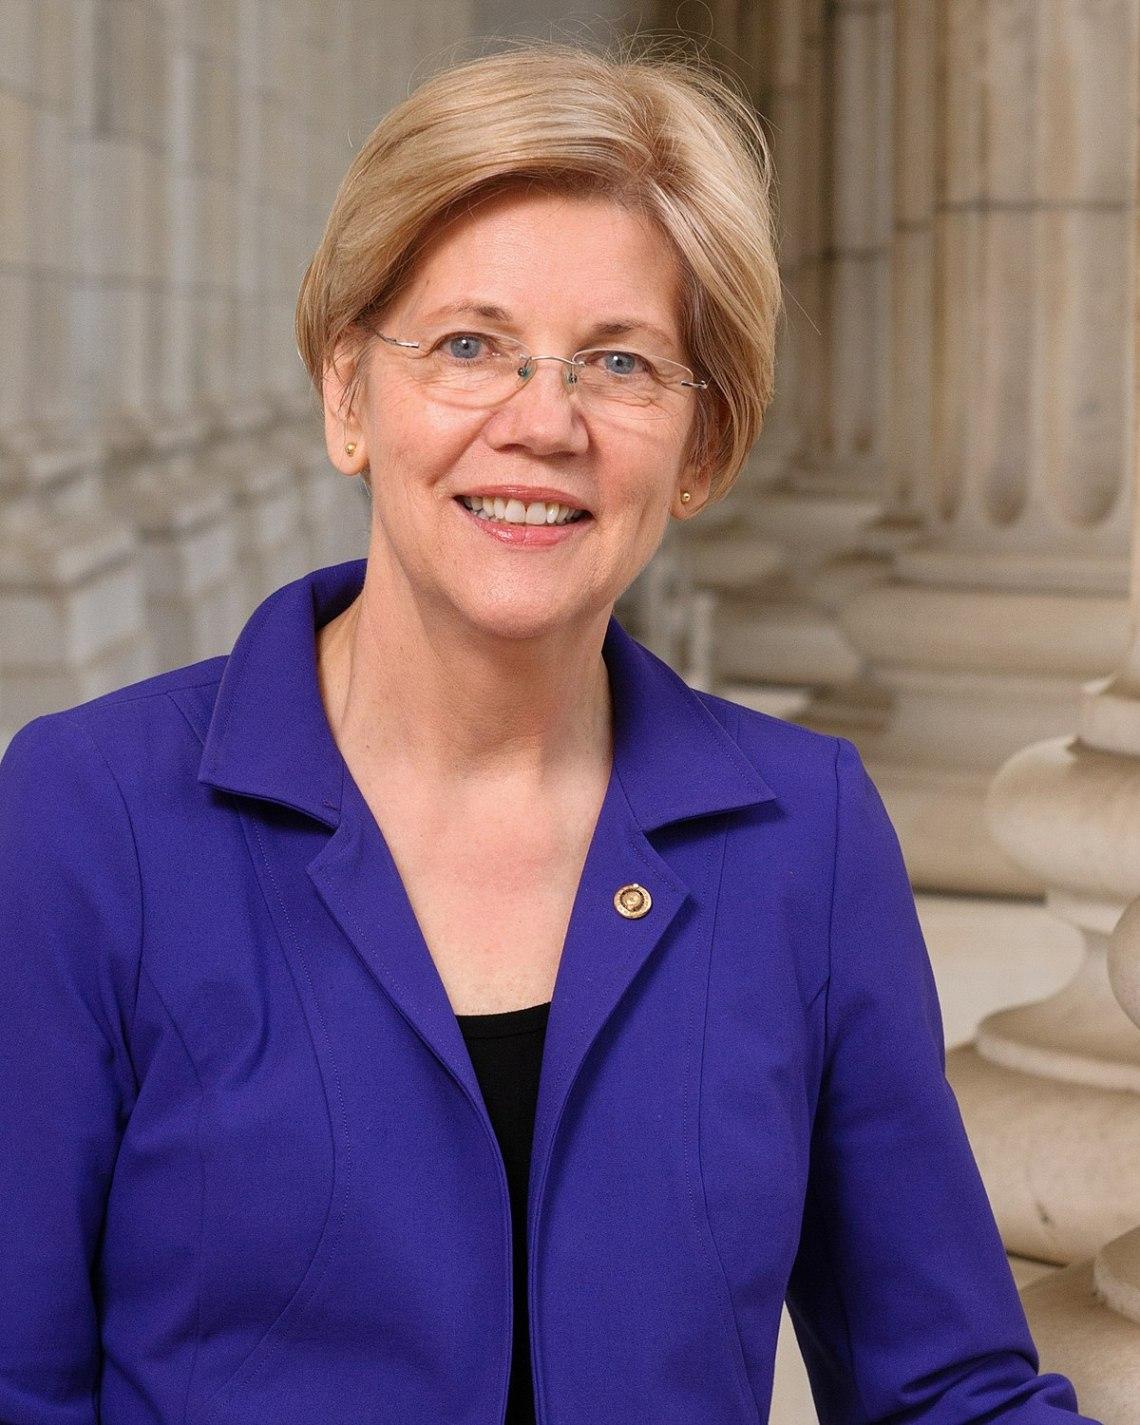 Elizabeth Warren Wikipedia